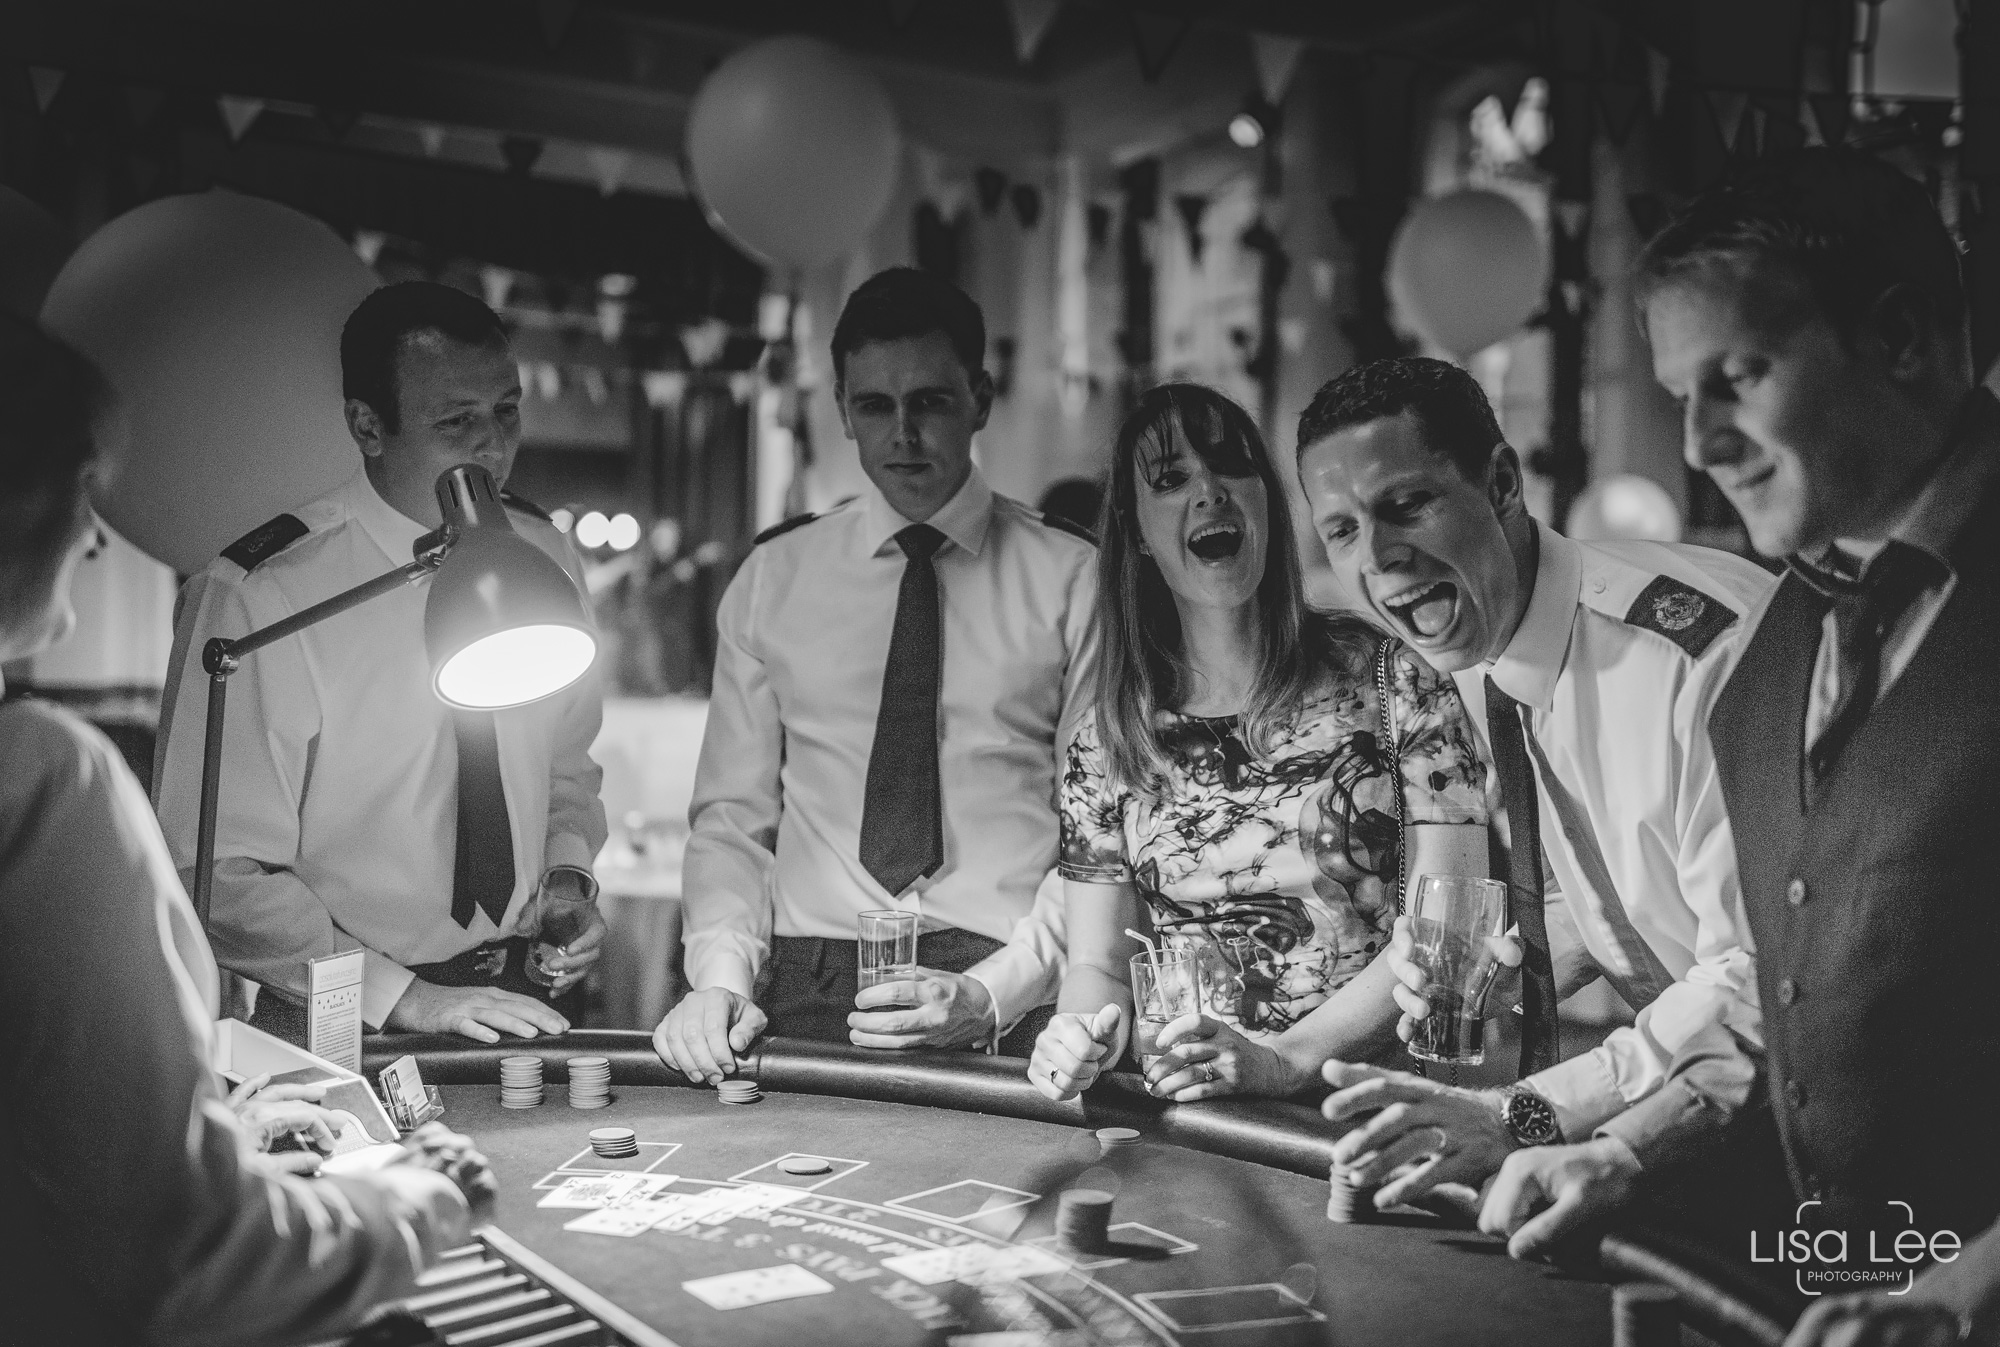 lisa-lee-wedding-photography-casino-talbot-heath-3.jpg